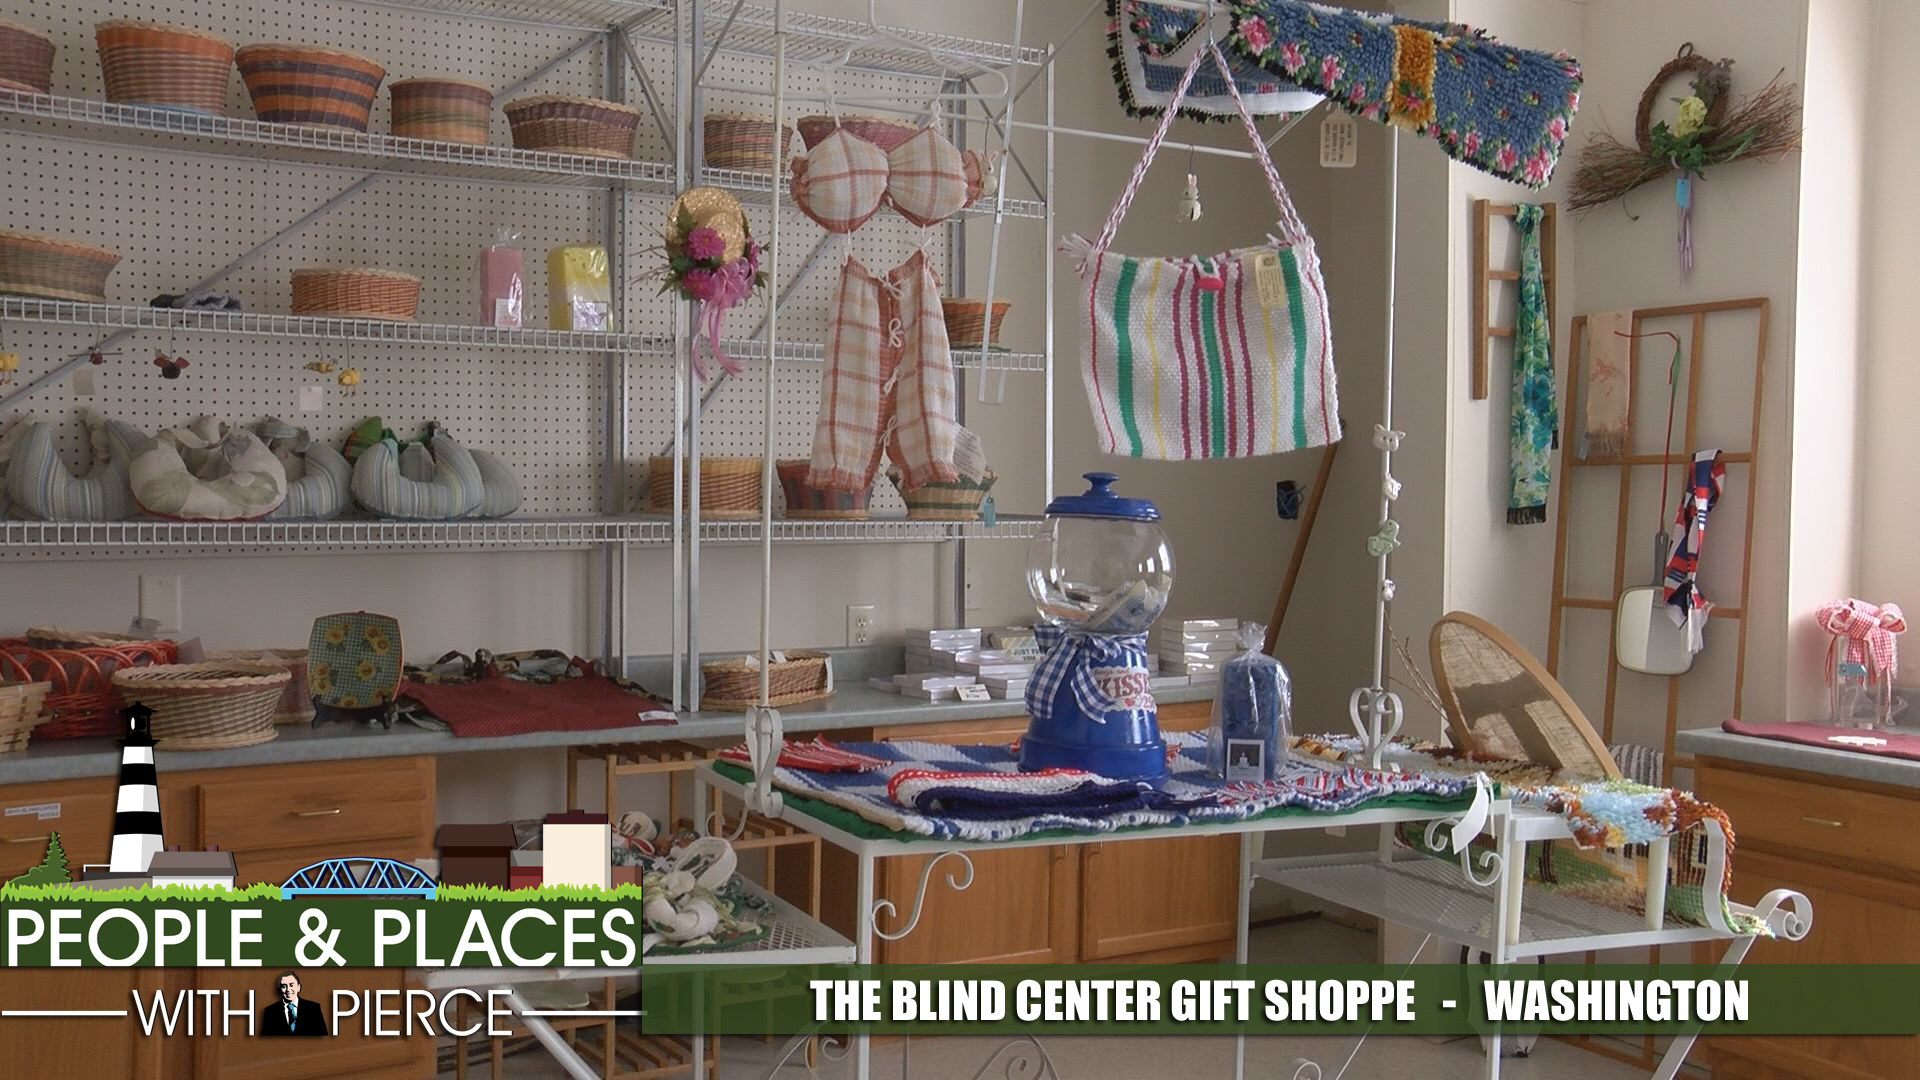 washington blind center gift shop ppp for web_527374